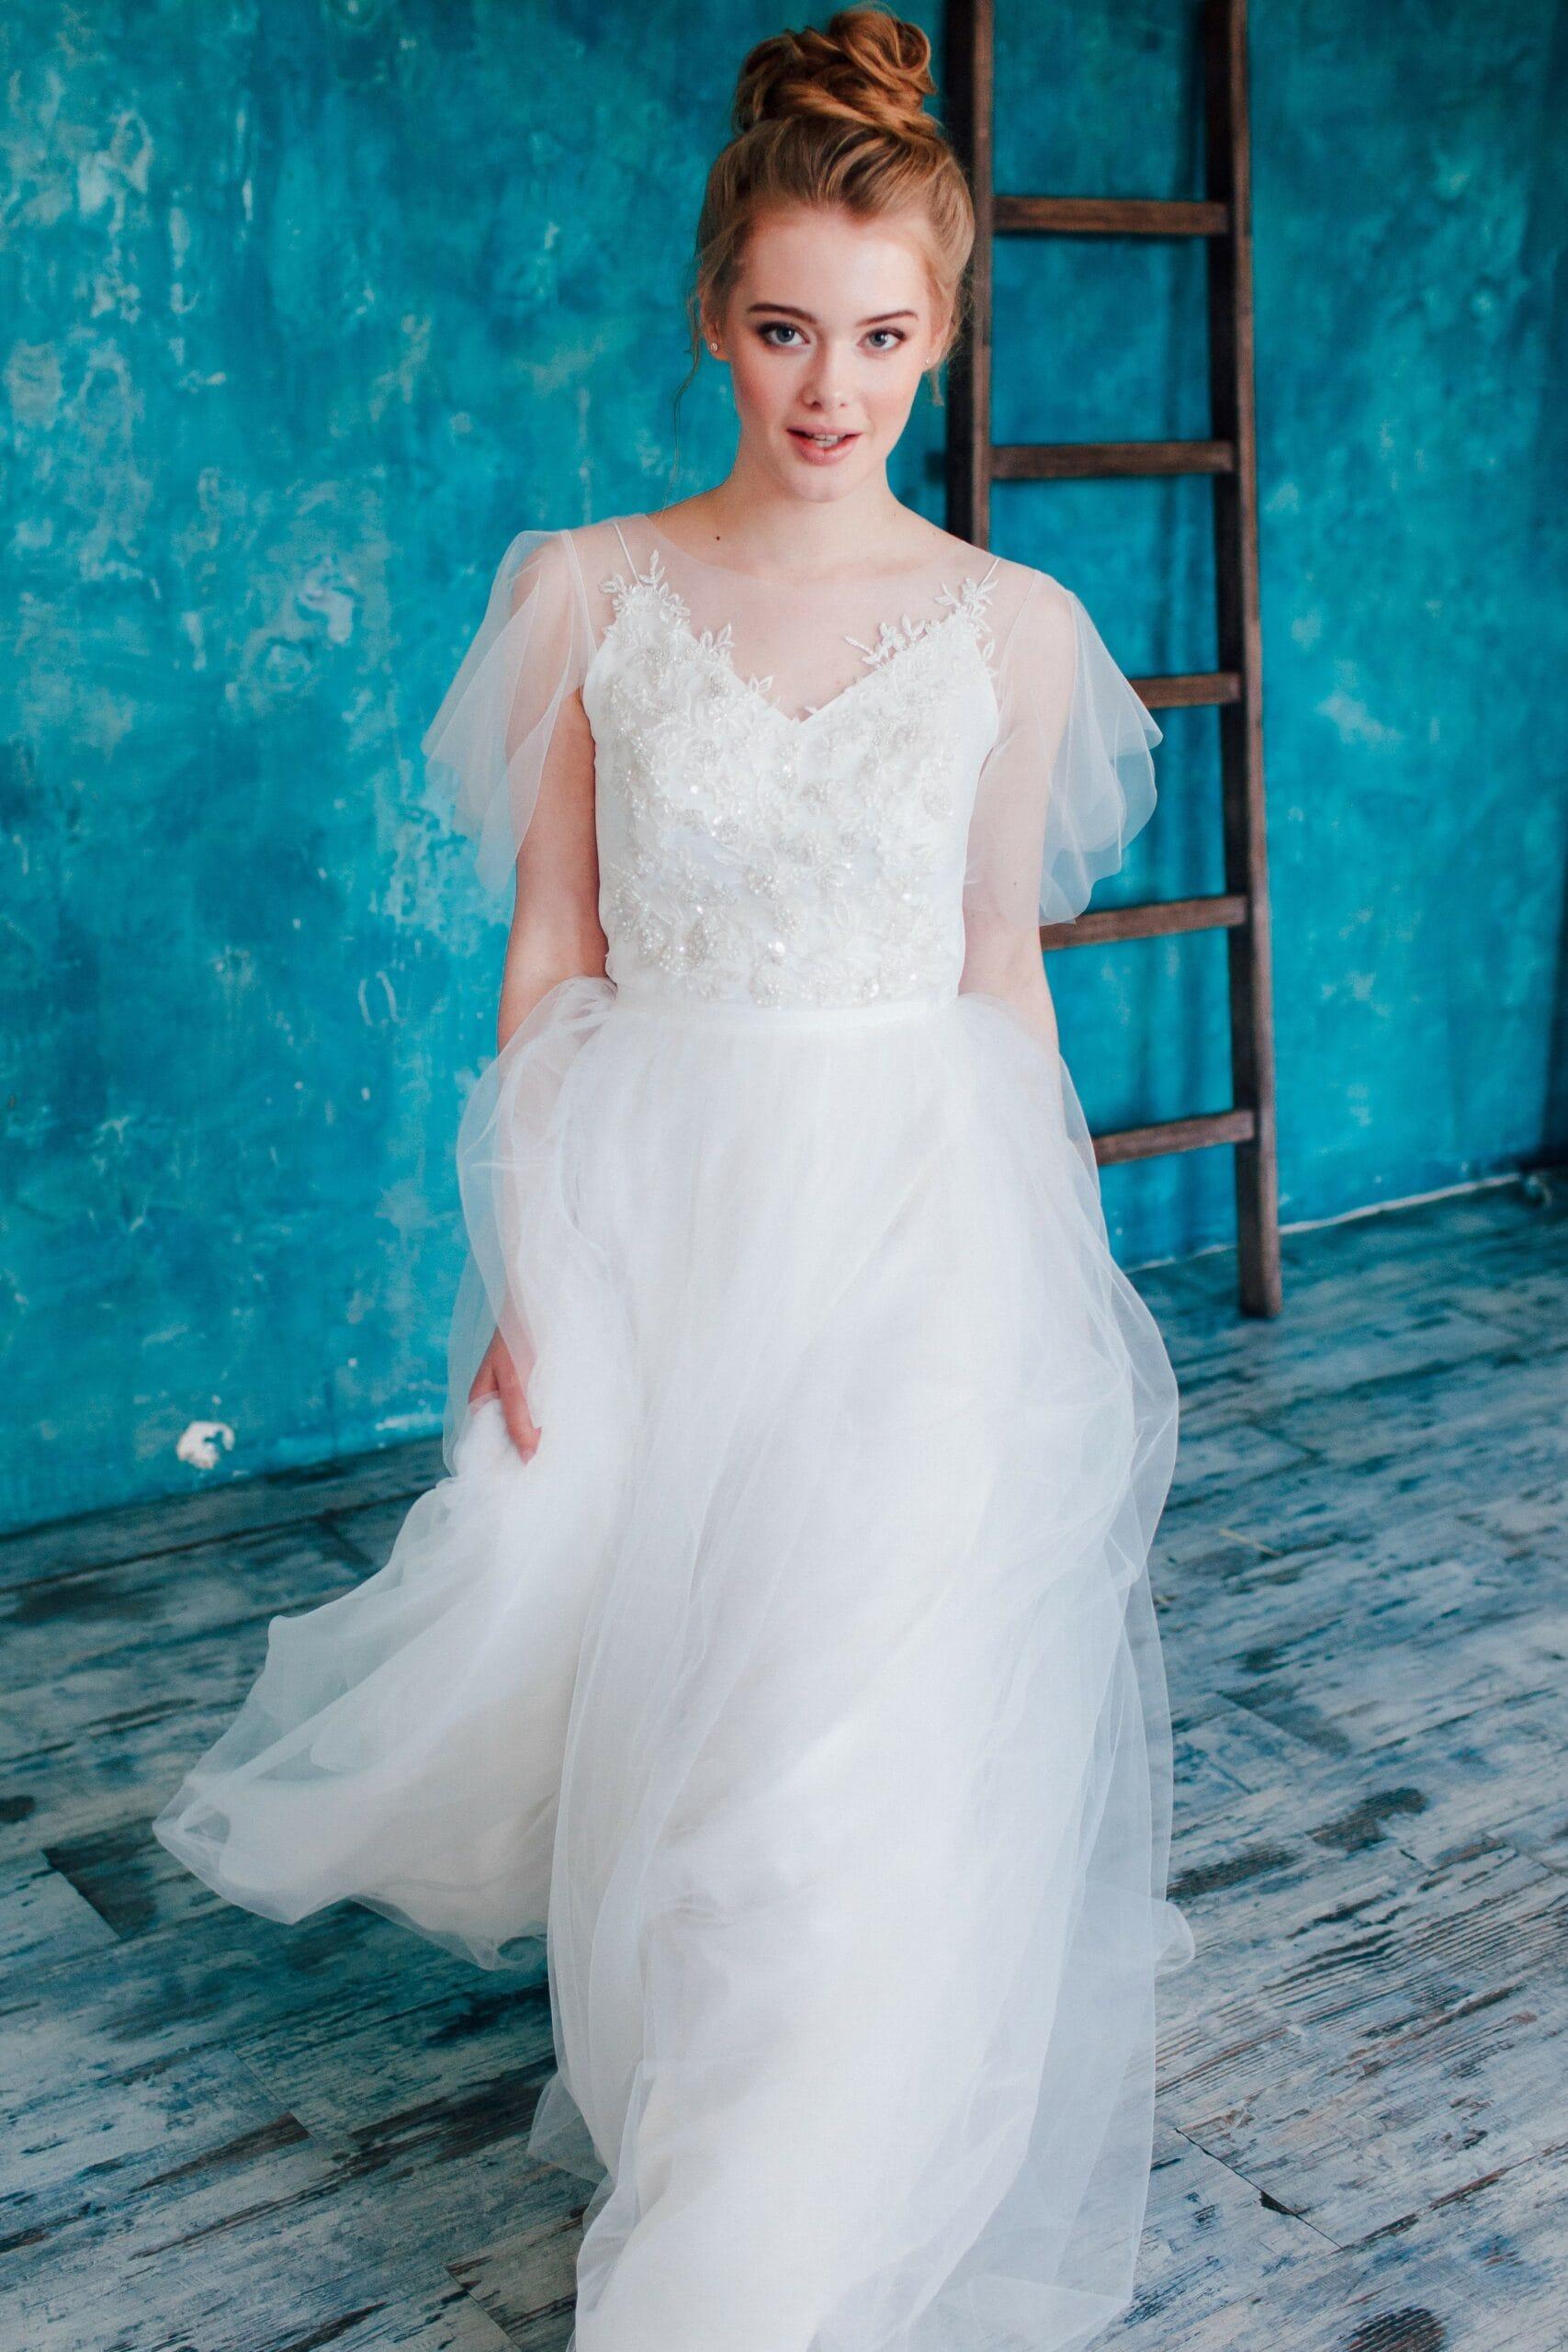 Свадебное платье EXOUSIA, коллекция THE ANGELS, бренд RARE BRIDAL, фото 2